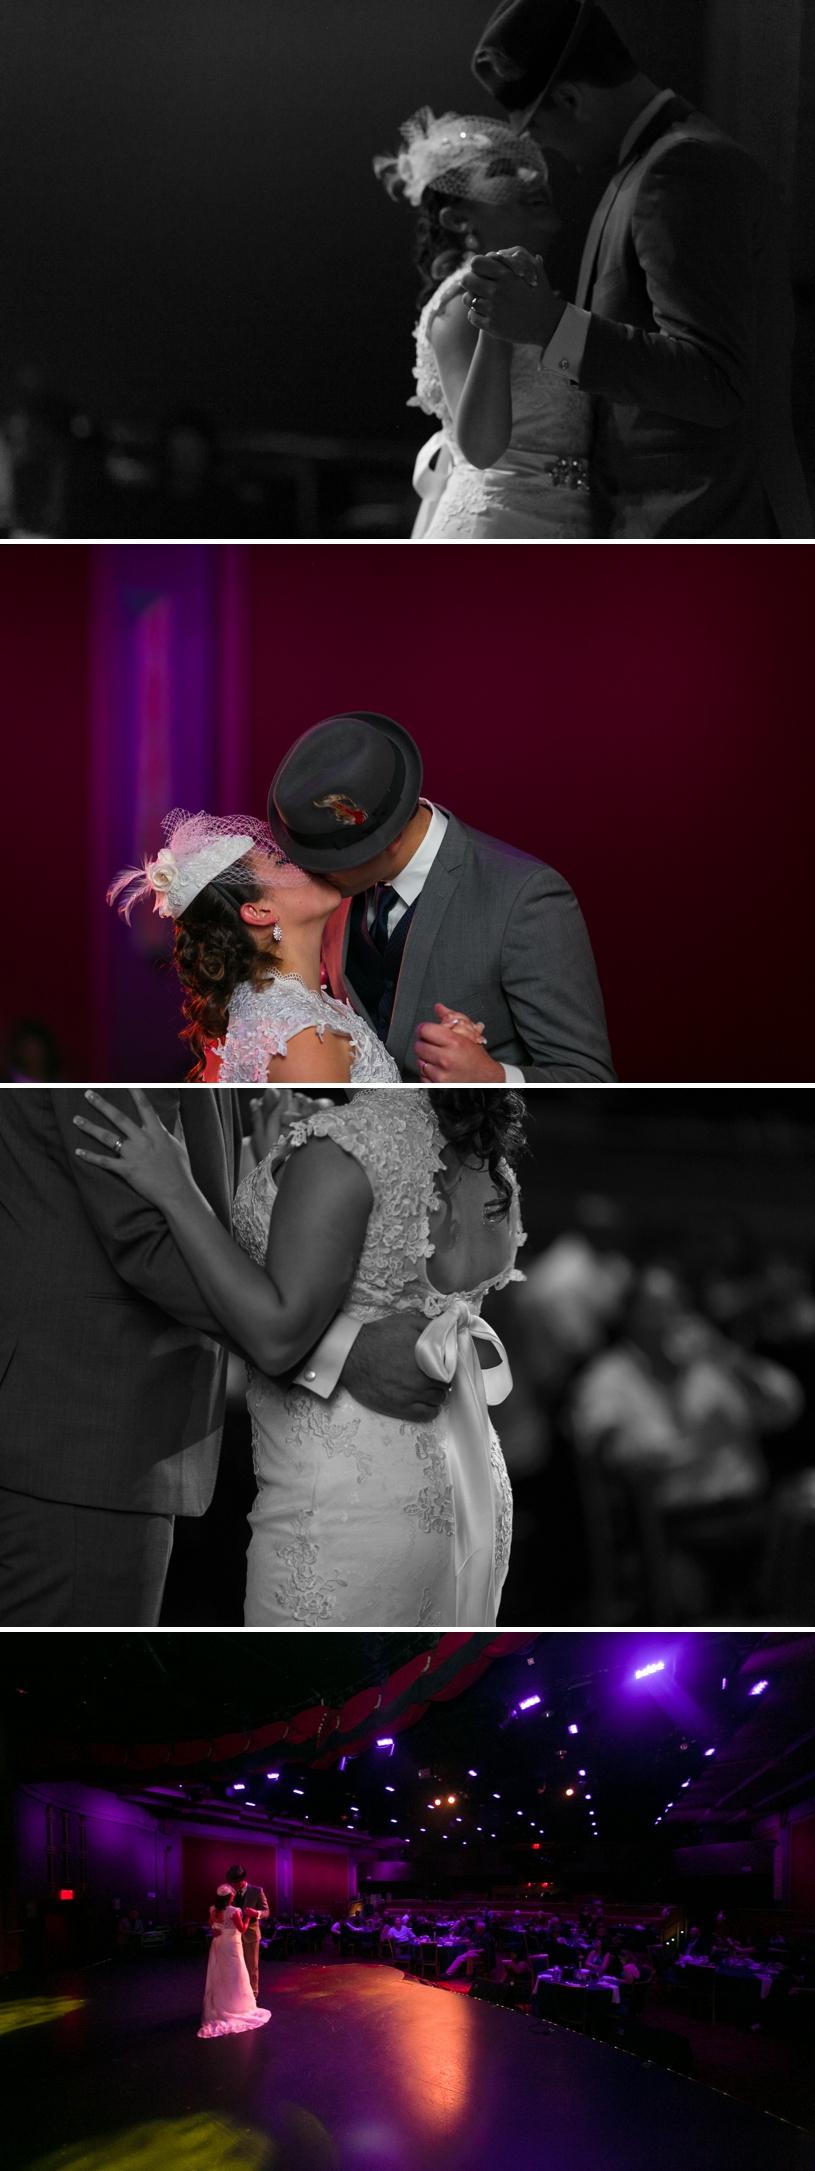 Movie-theater-wedding7